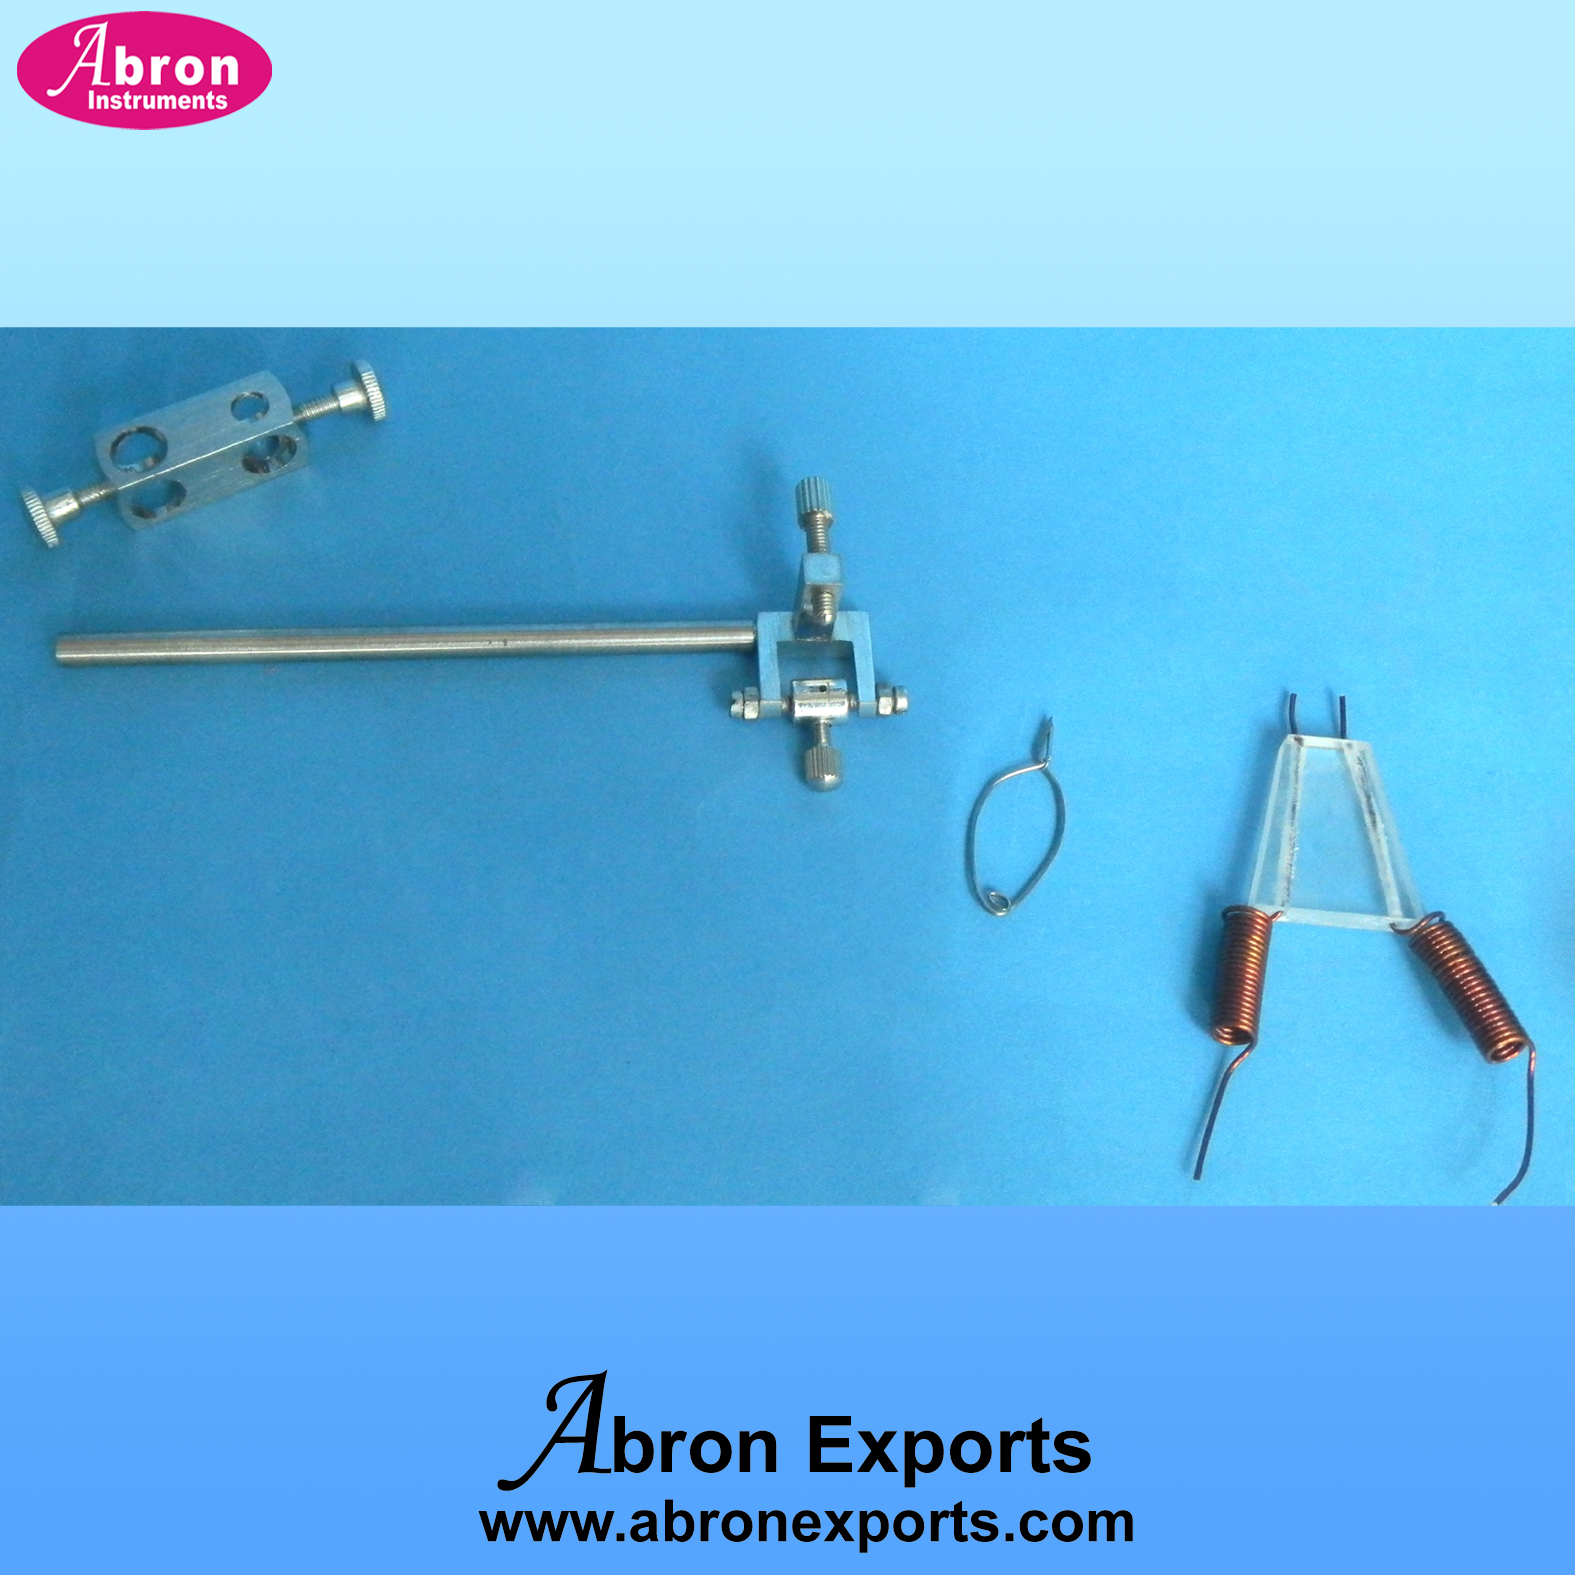 kymograph stilumator probe clamp arrow x block heary clips abron APH-2550-35B